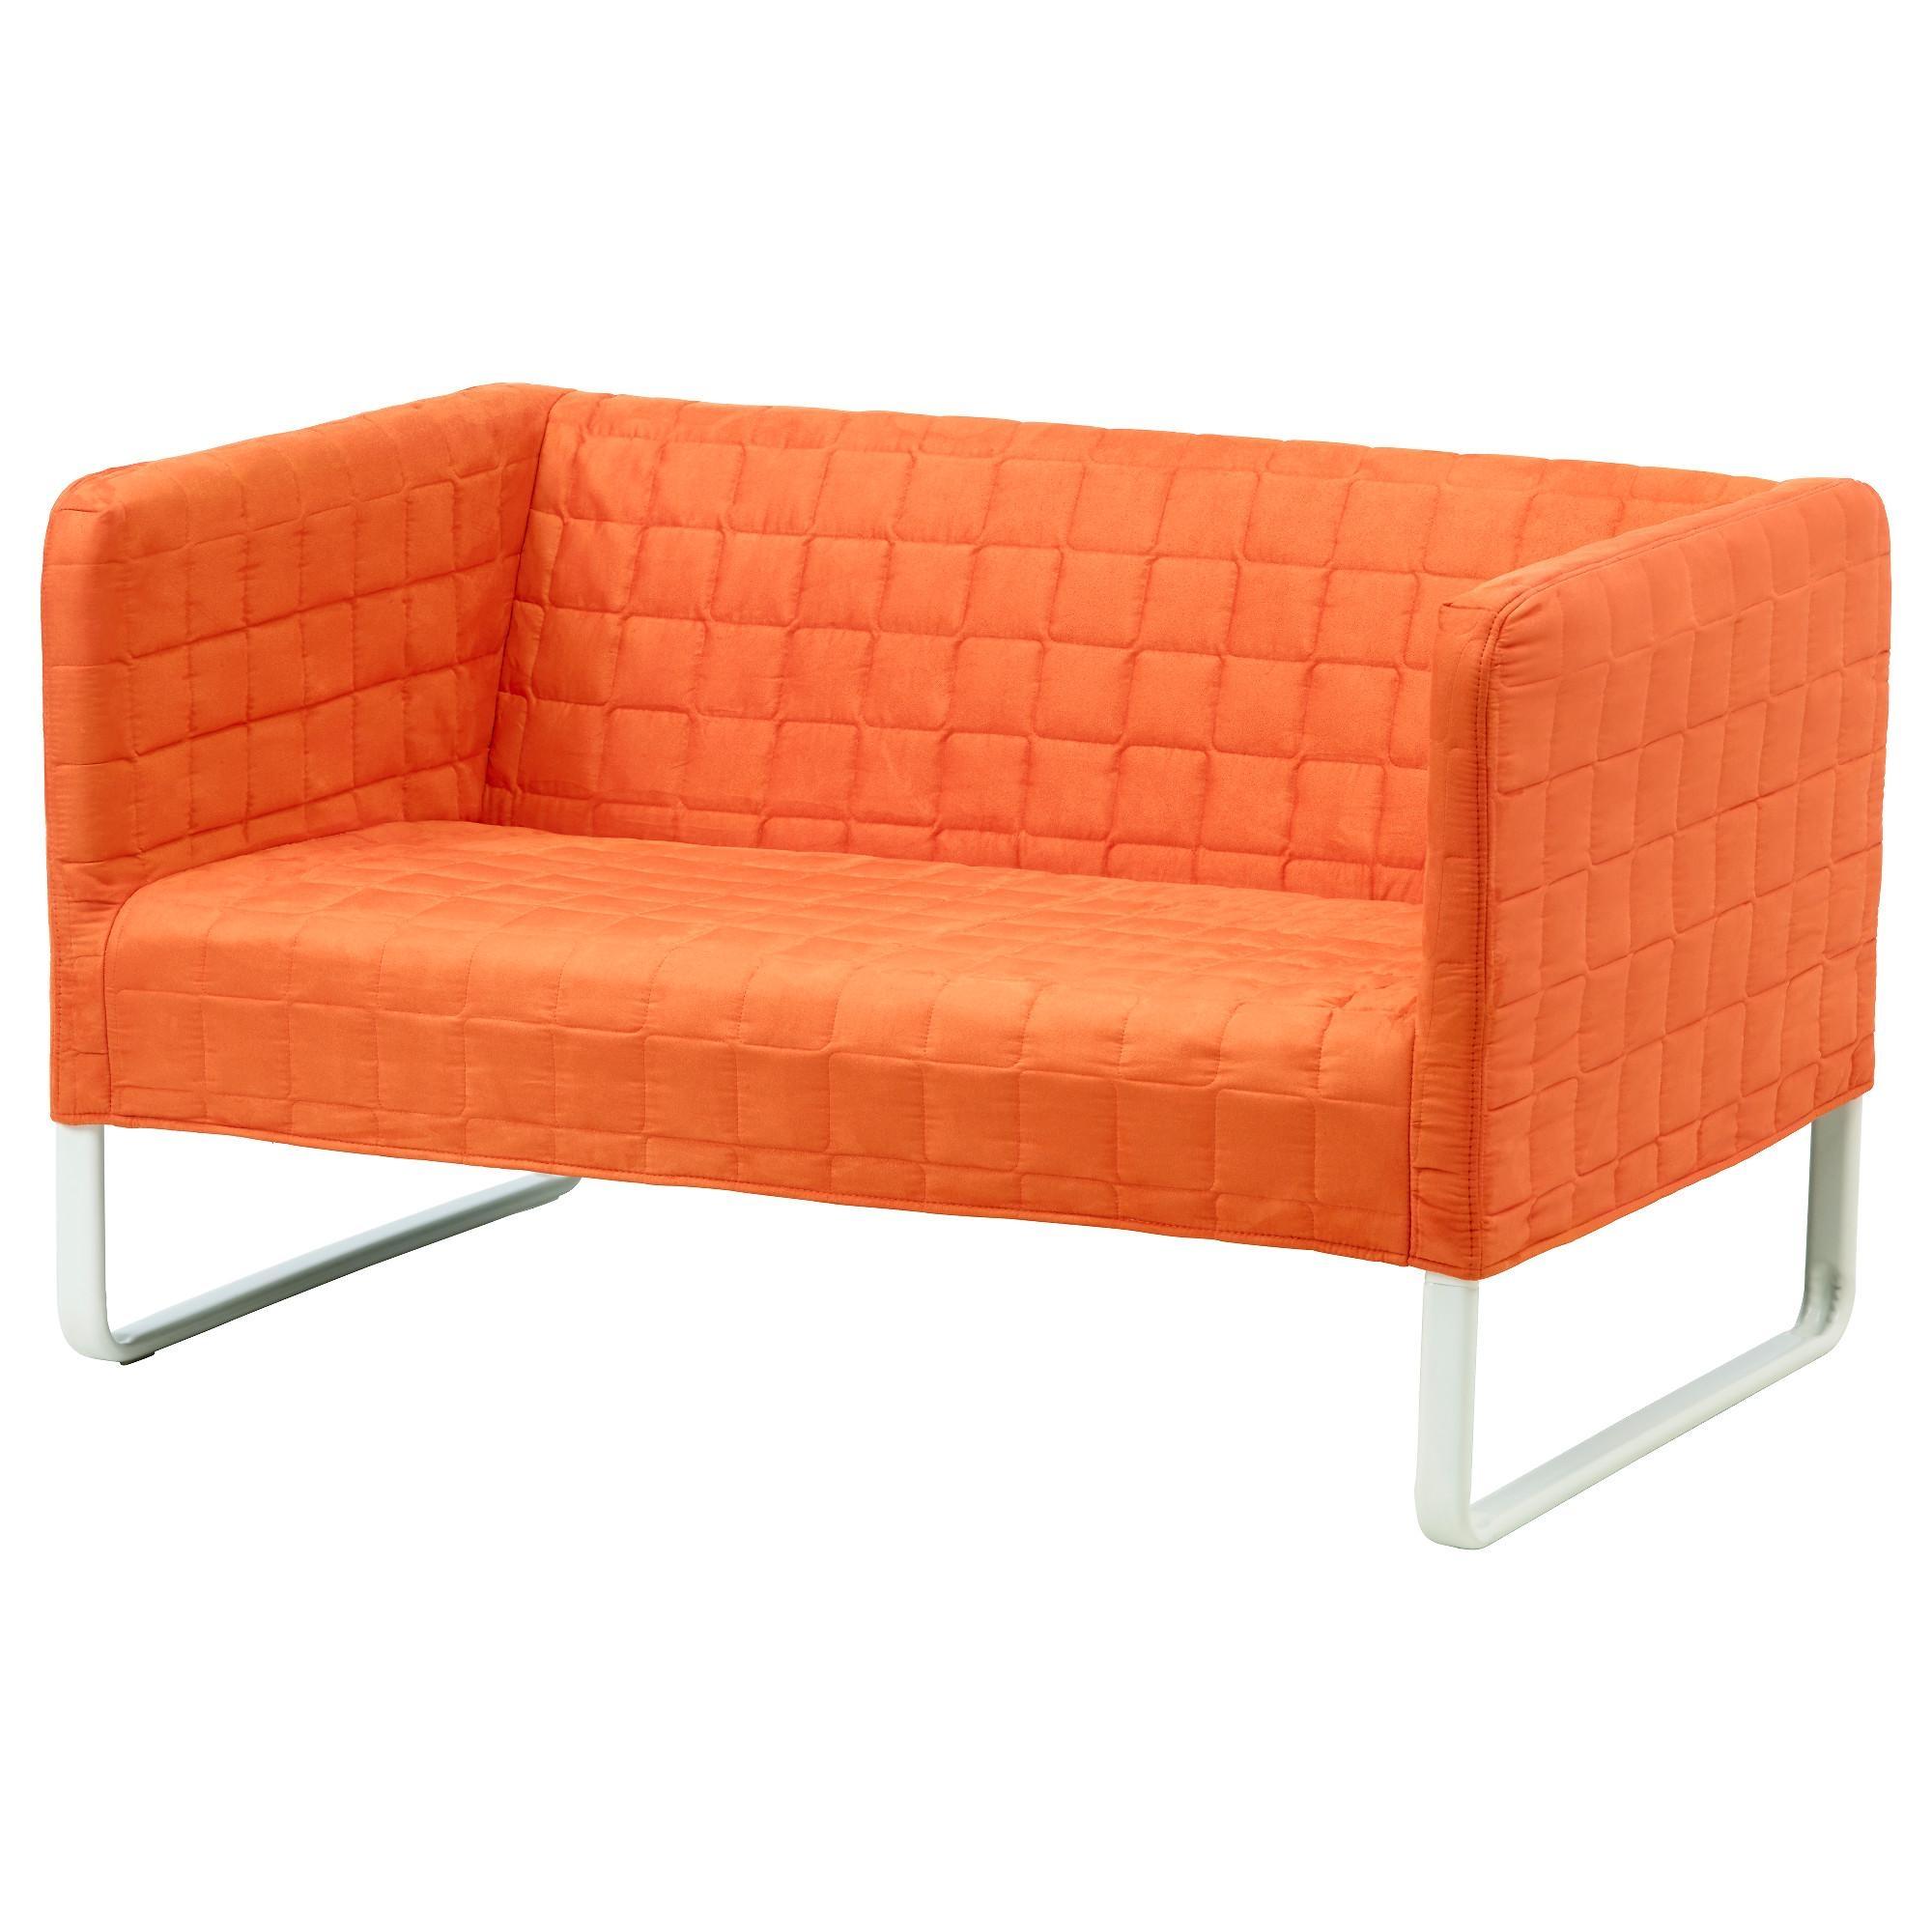 Knopparp 2-Seat Sofa Orange - Ikea in Small Sofas Ikea